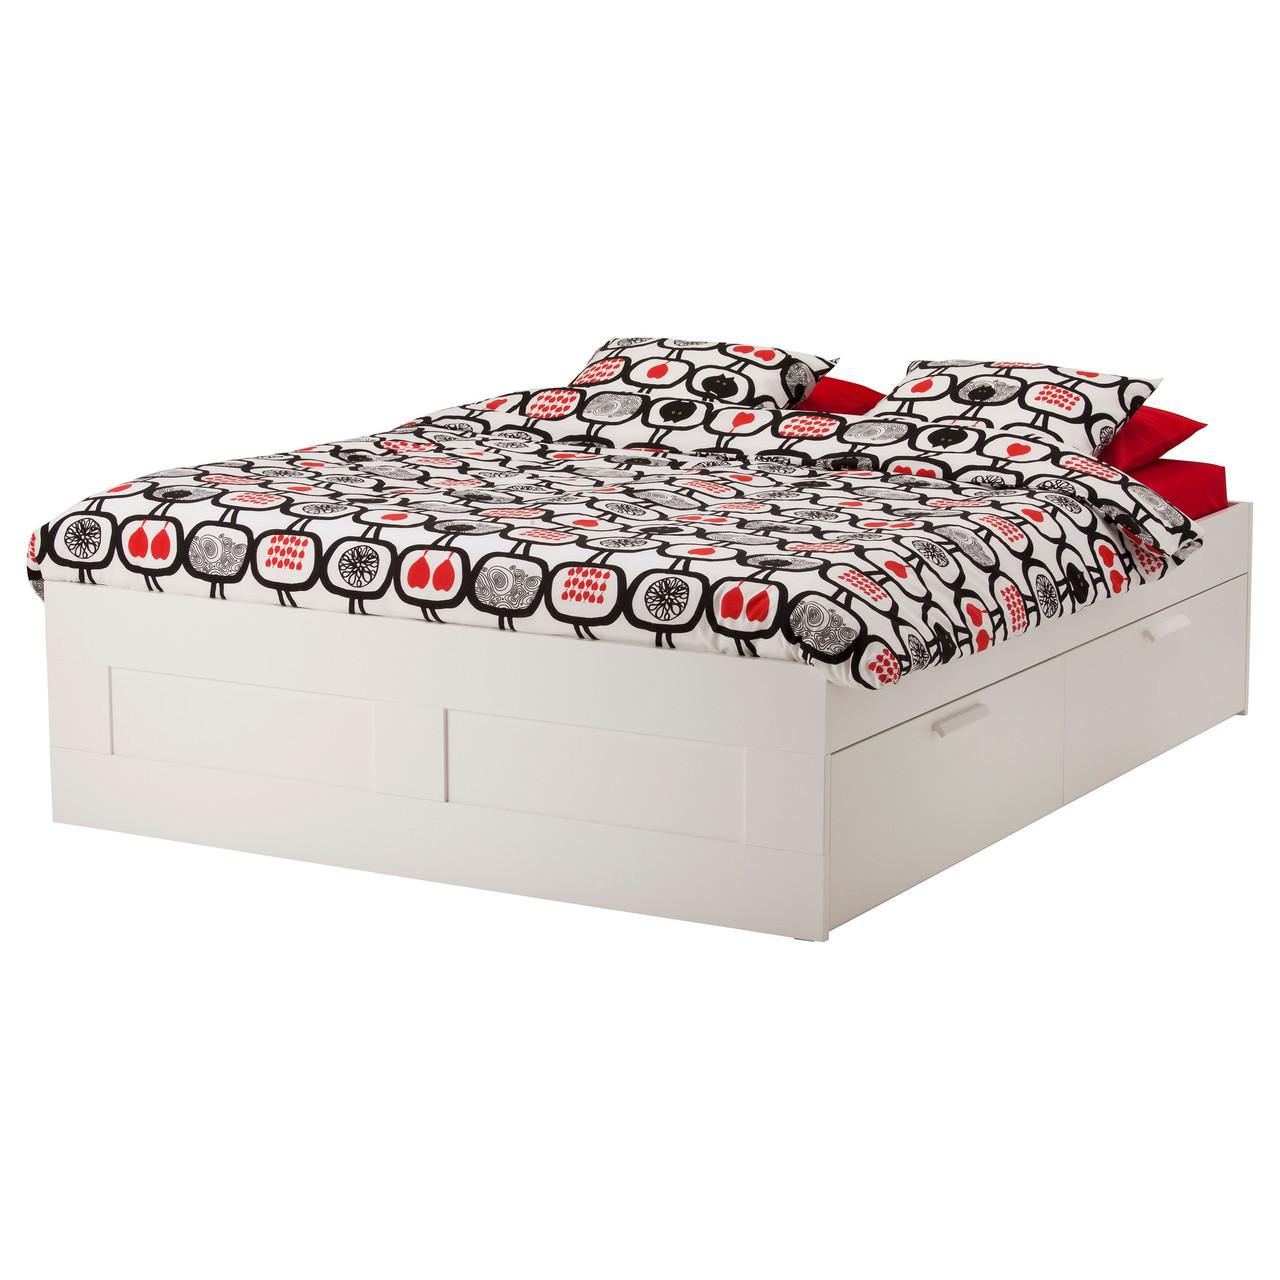 Brimnes Rama łóżka Z Szufladami Biały Lönset 29018740 продажа цена в киеве кровати от Dom Online маркет товаров для дома и работы Ikea